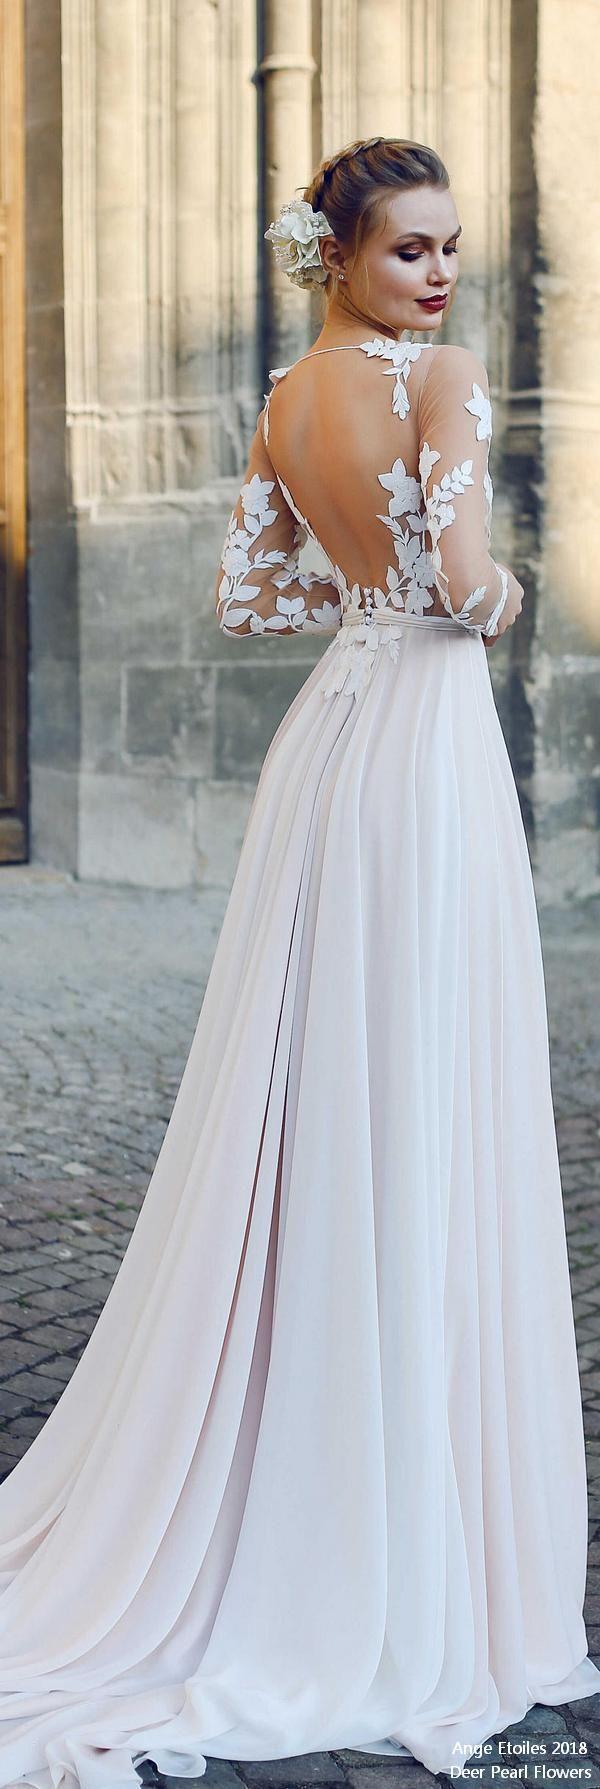 EVA fairy vintage wedding dress ❤️ http://www.deerpearlflowers.com/ange-etoiles-2018-wedding-dresses/ #bridaldress #dress #weddingdress